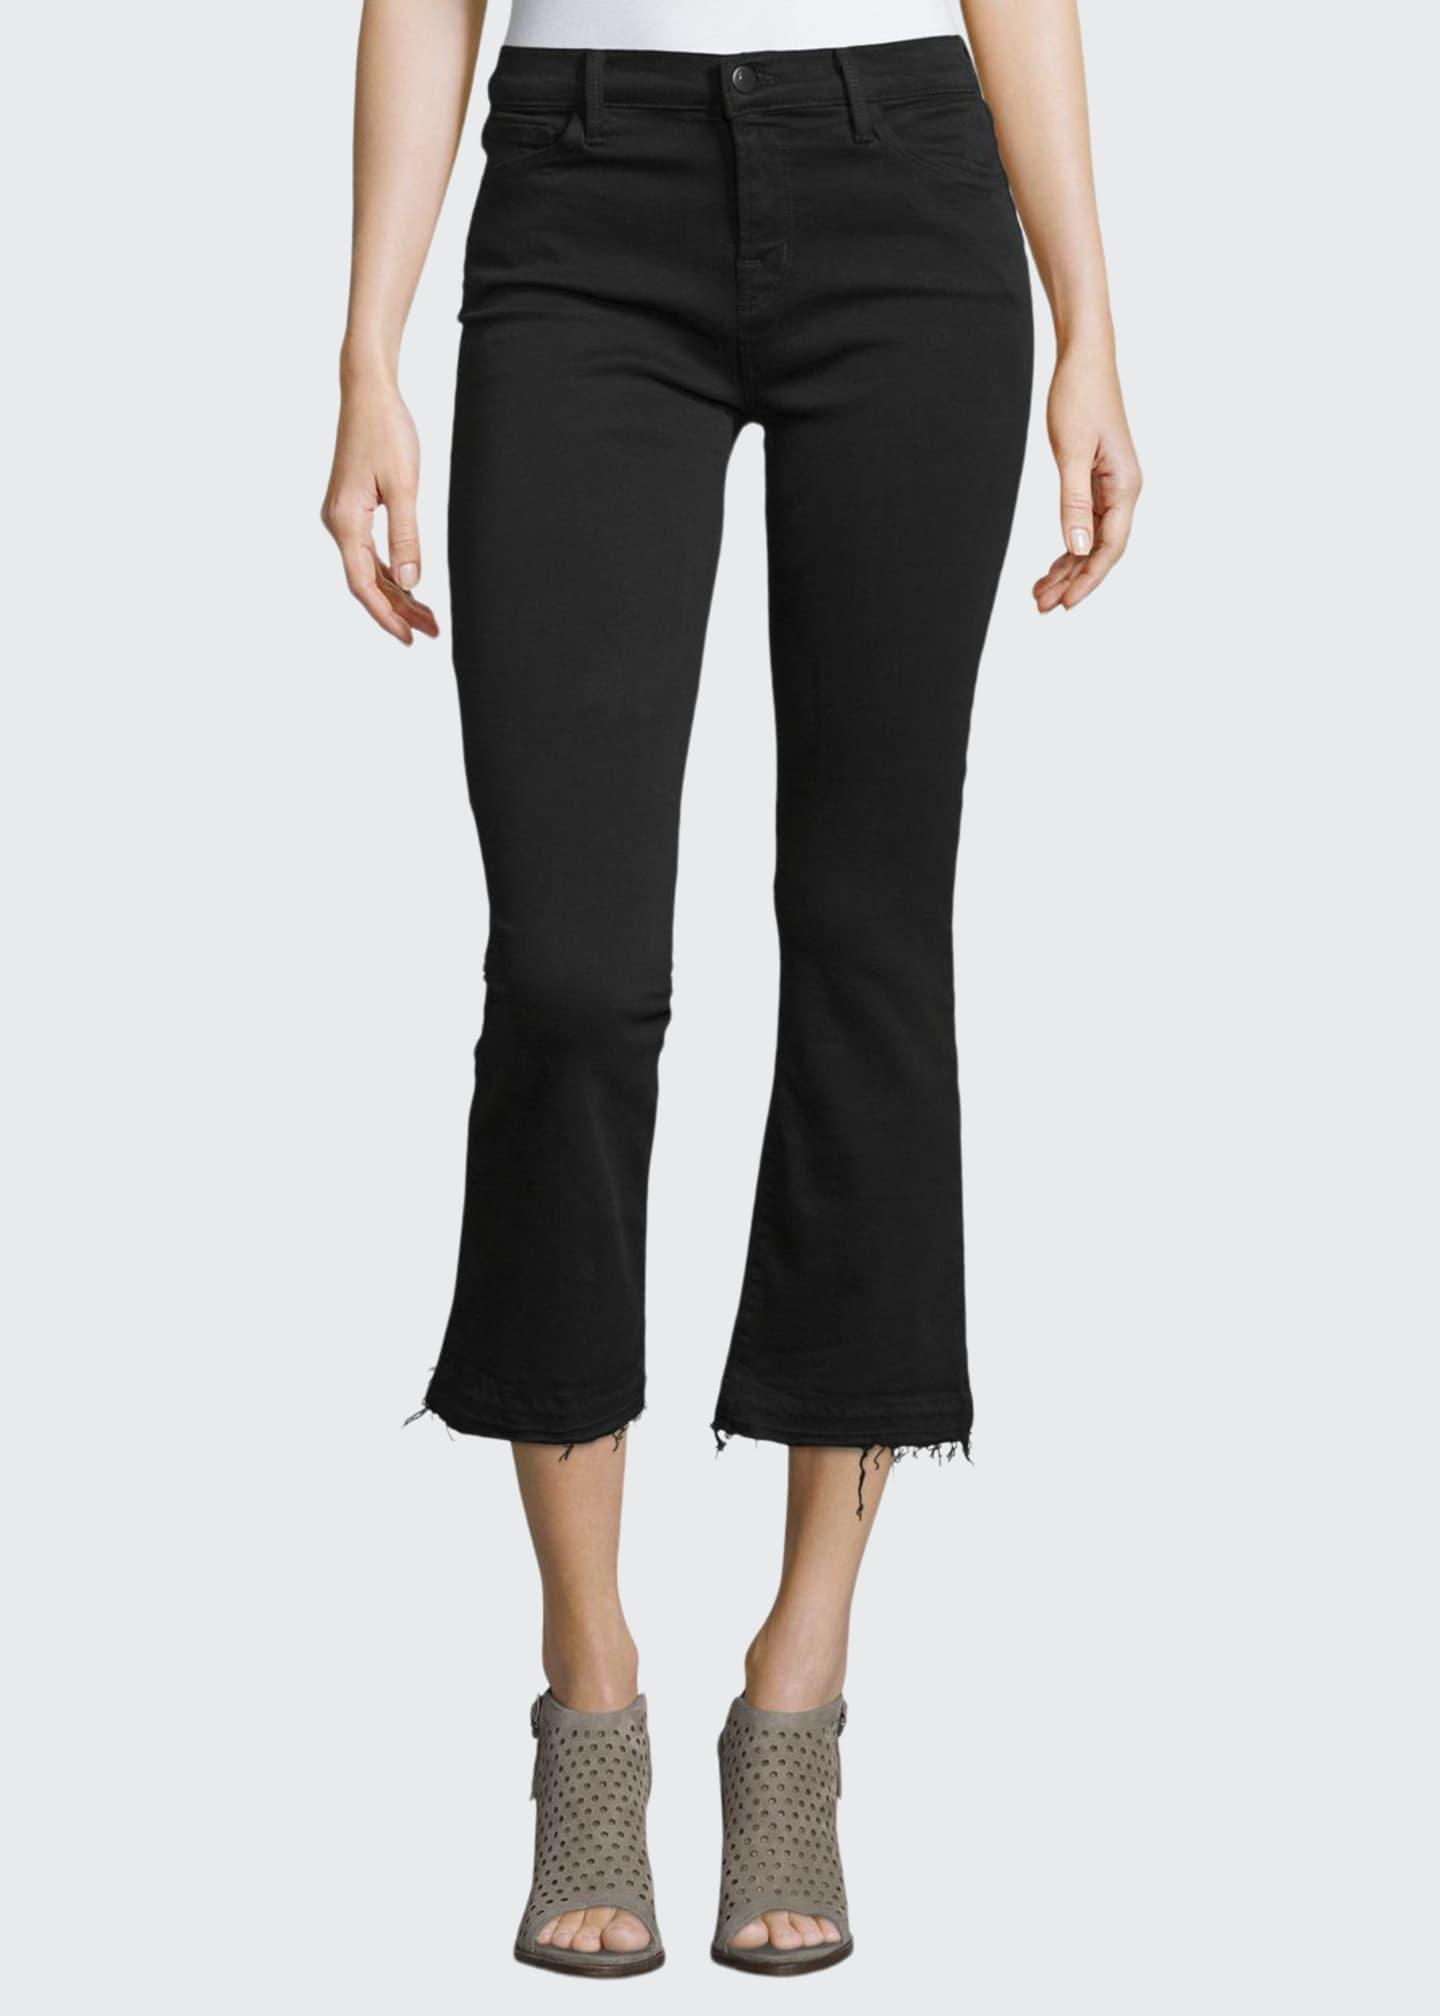 J Brand Selena Cropped Boot-Cut Jeans, Black